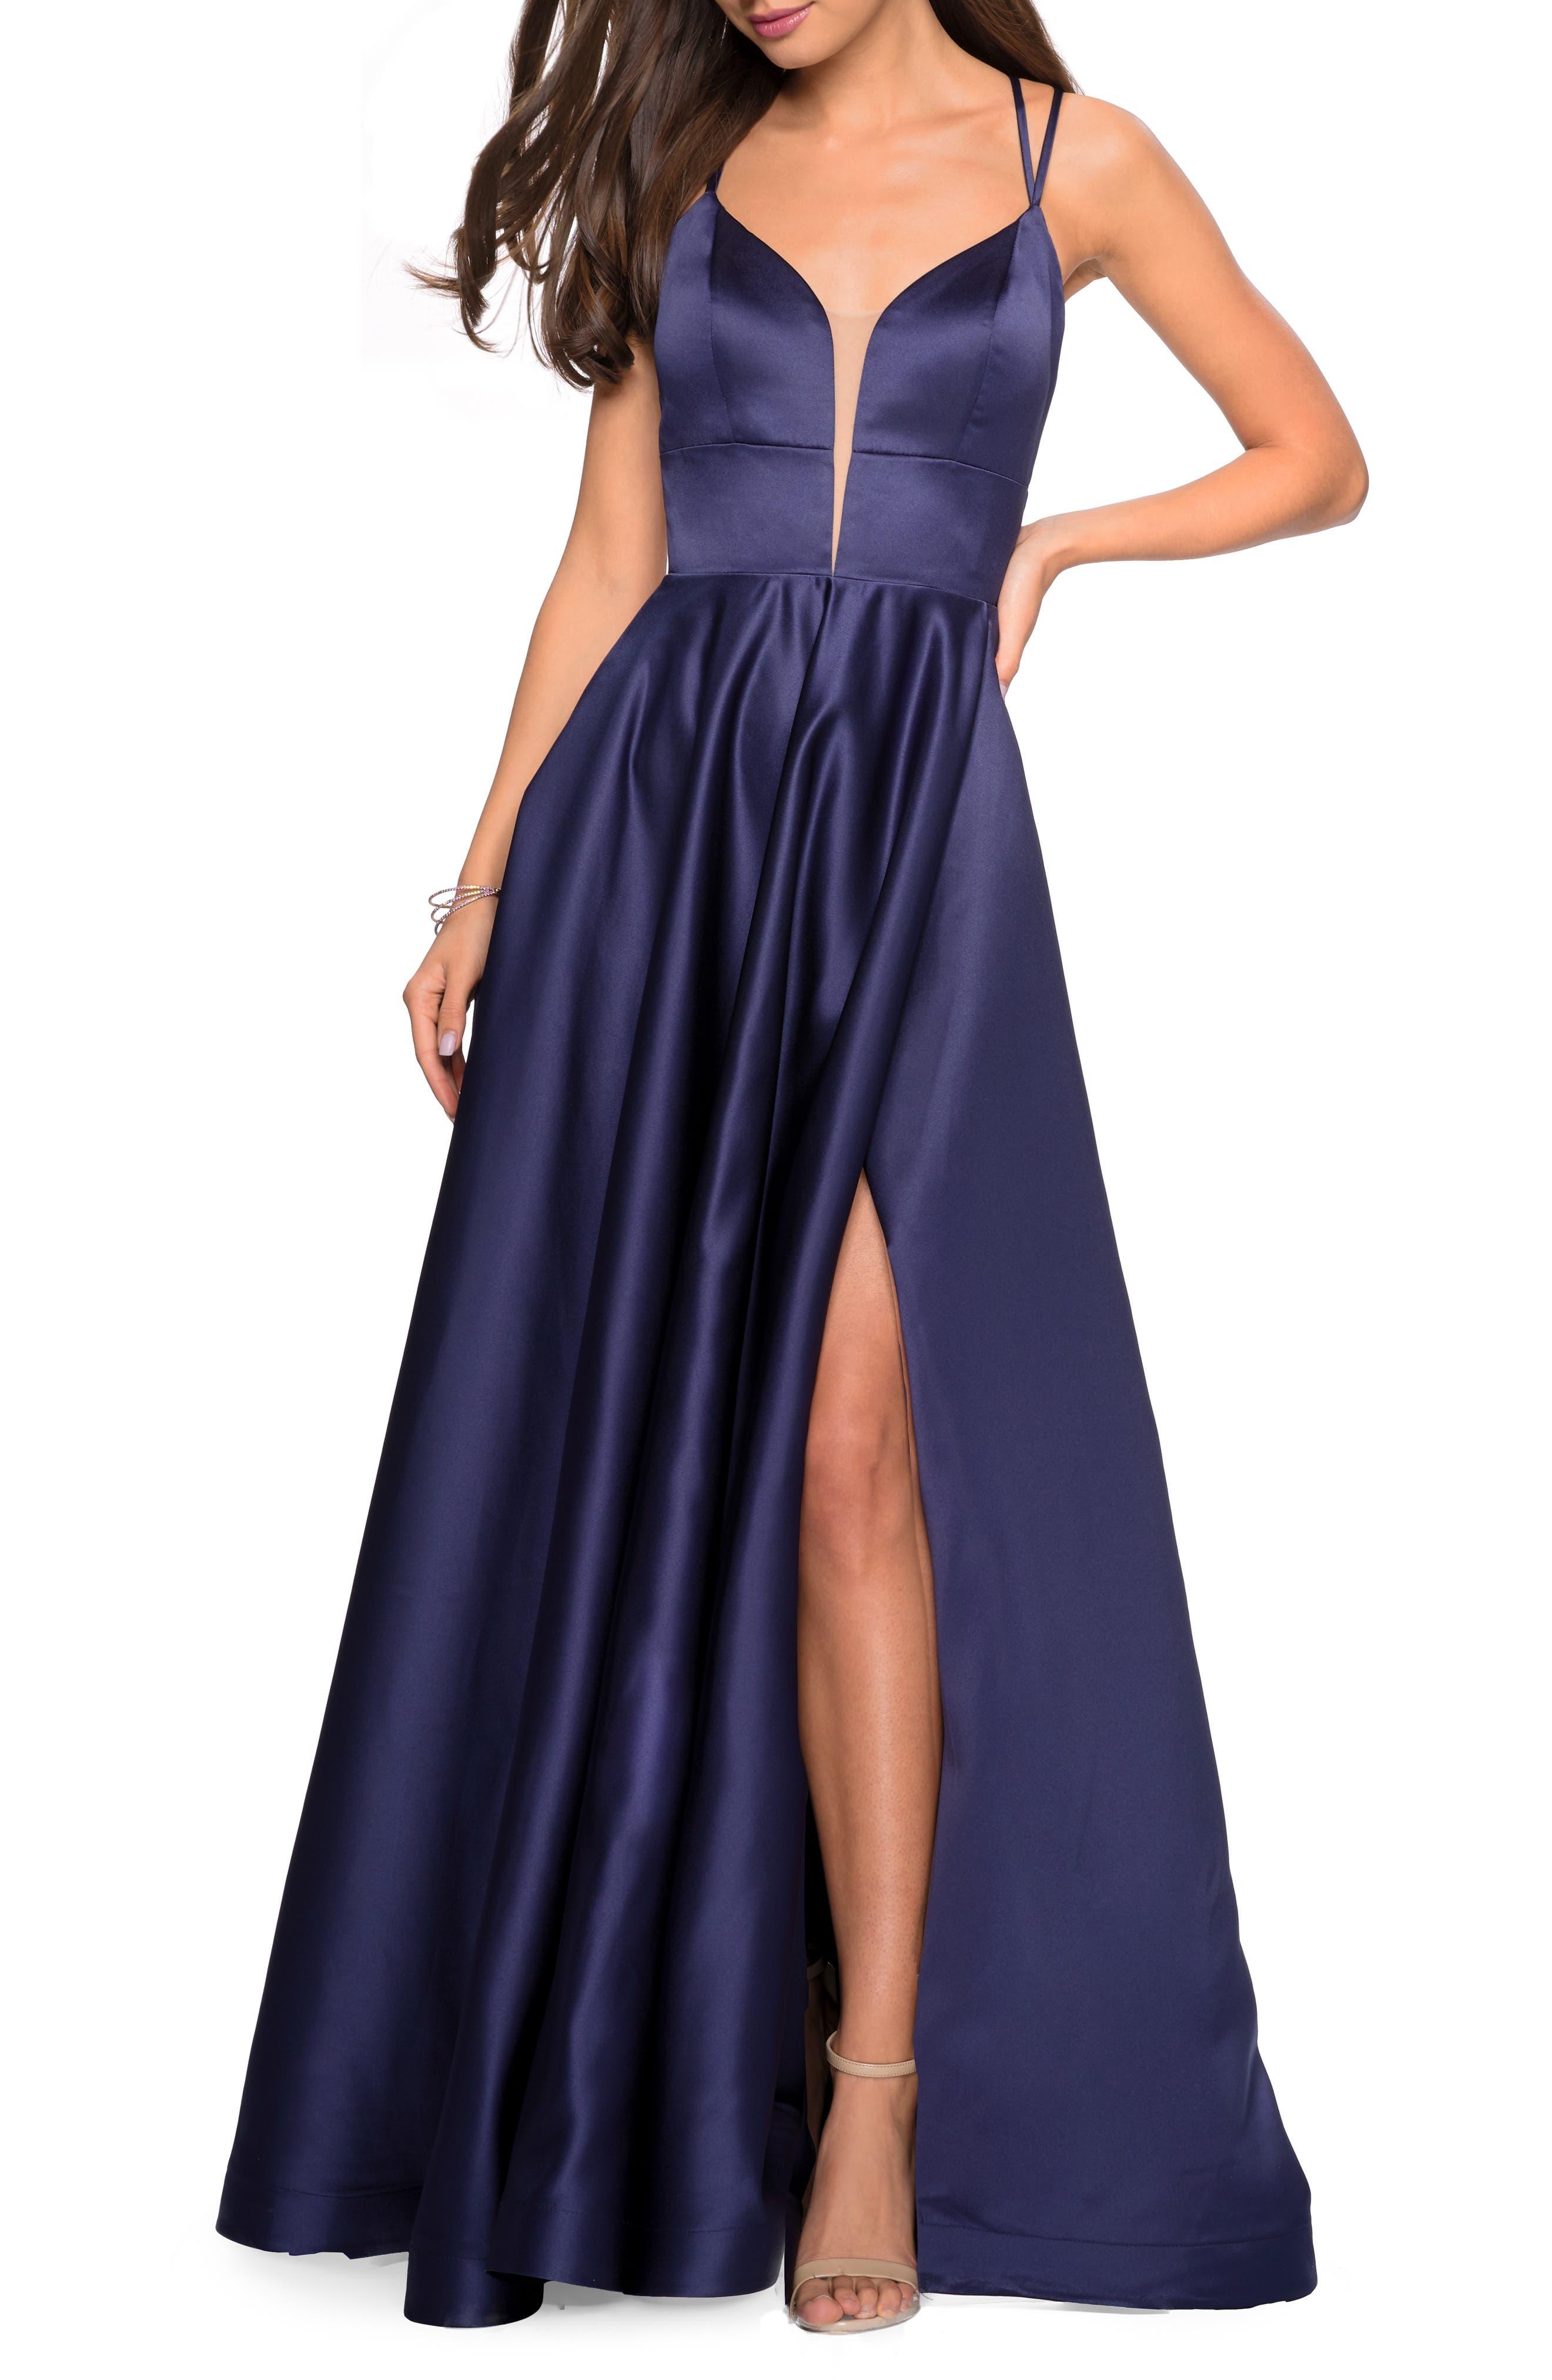 La Femme Strappy Back Satin Evening Dress, Blue